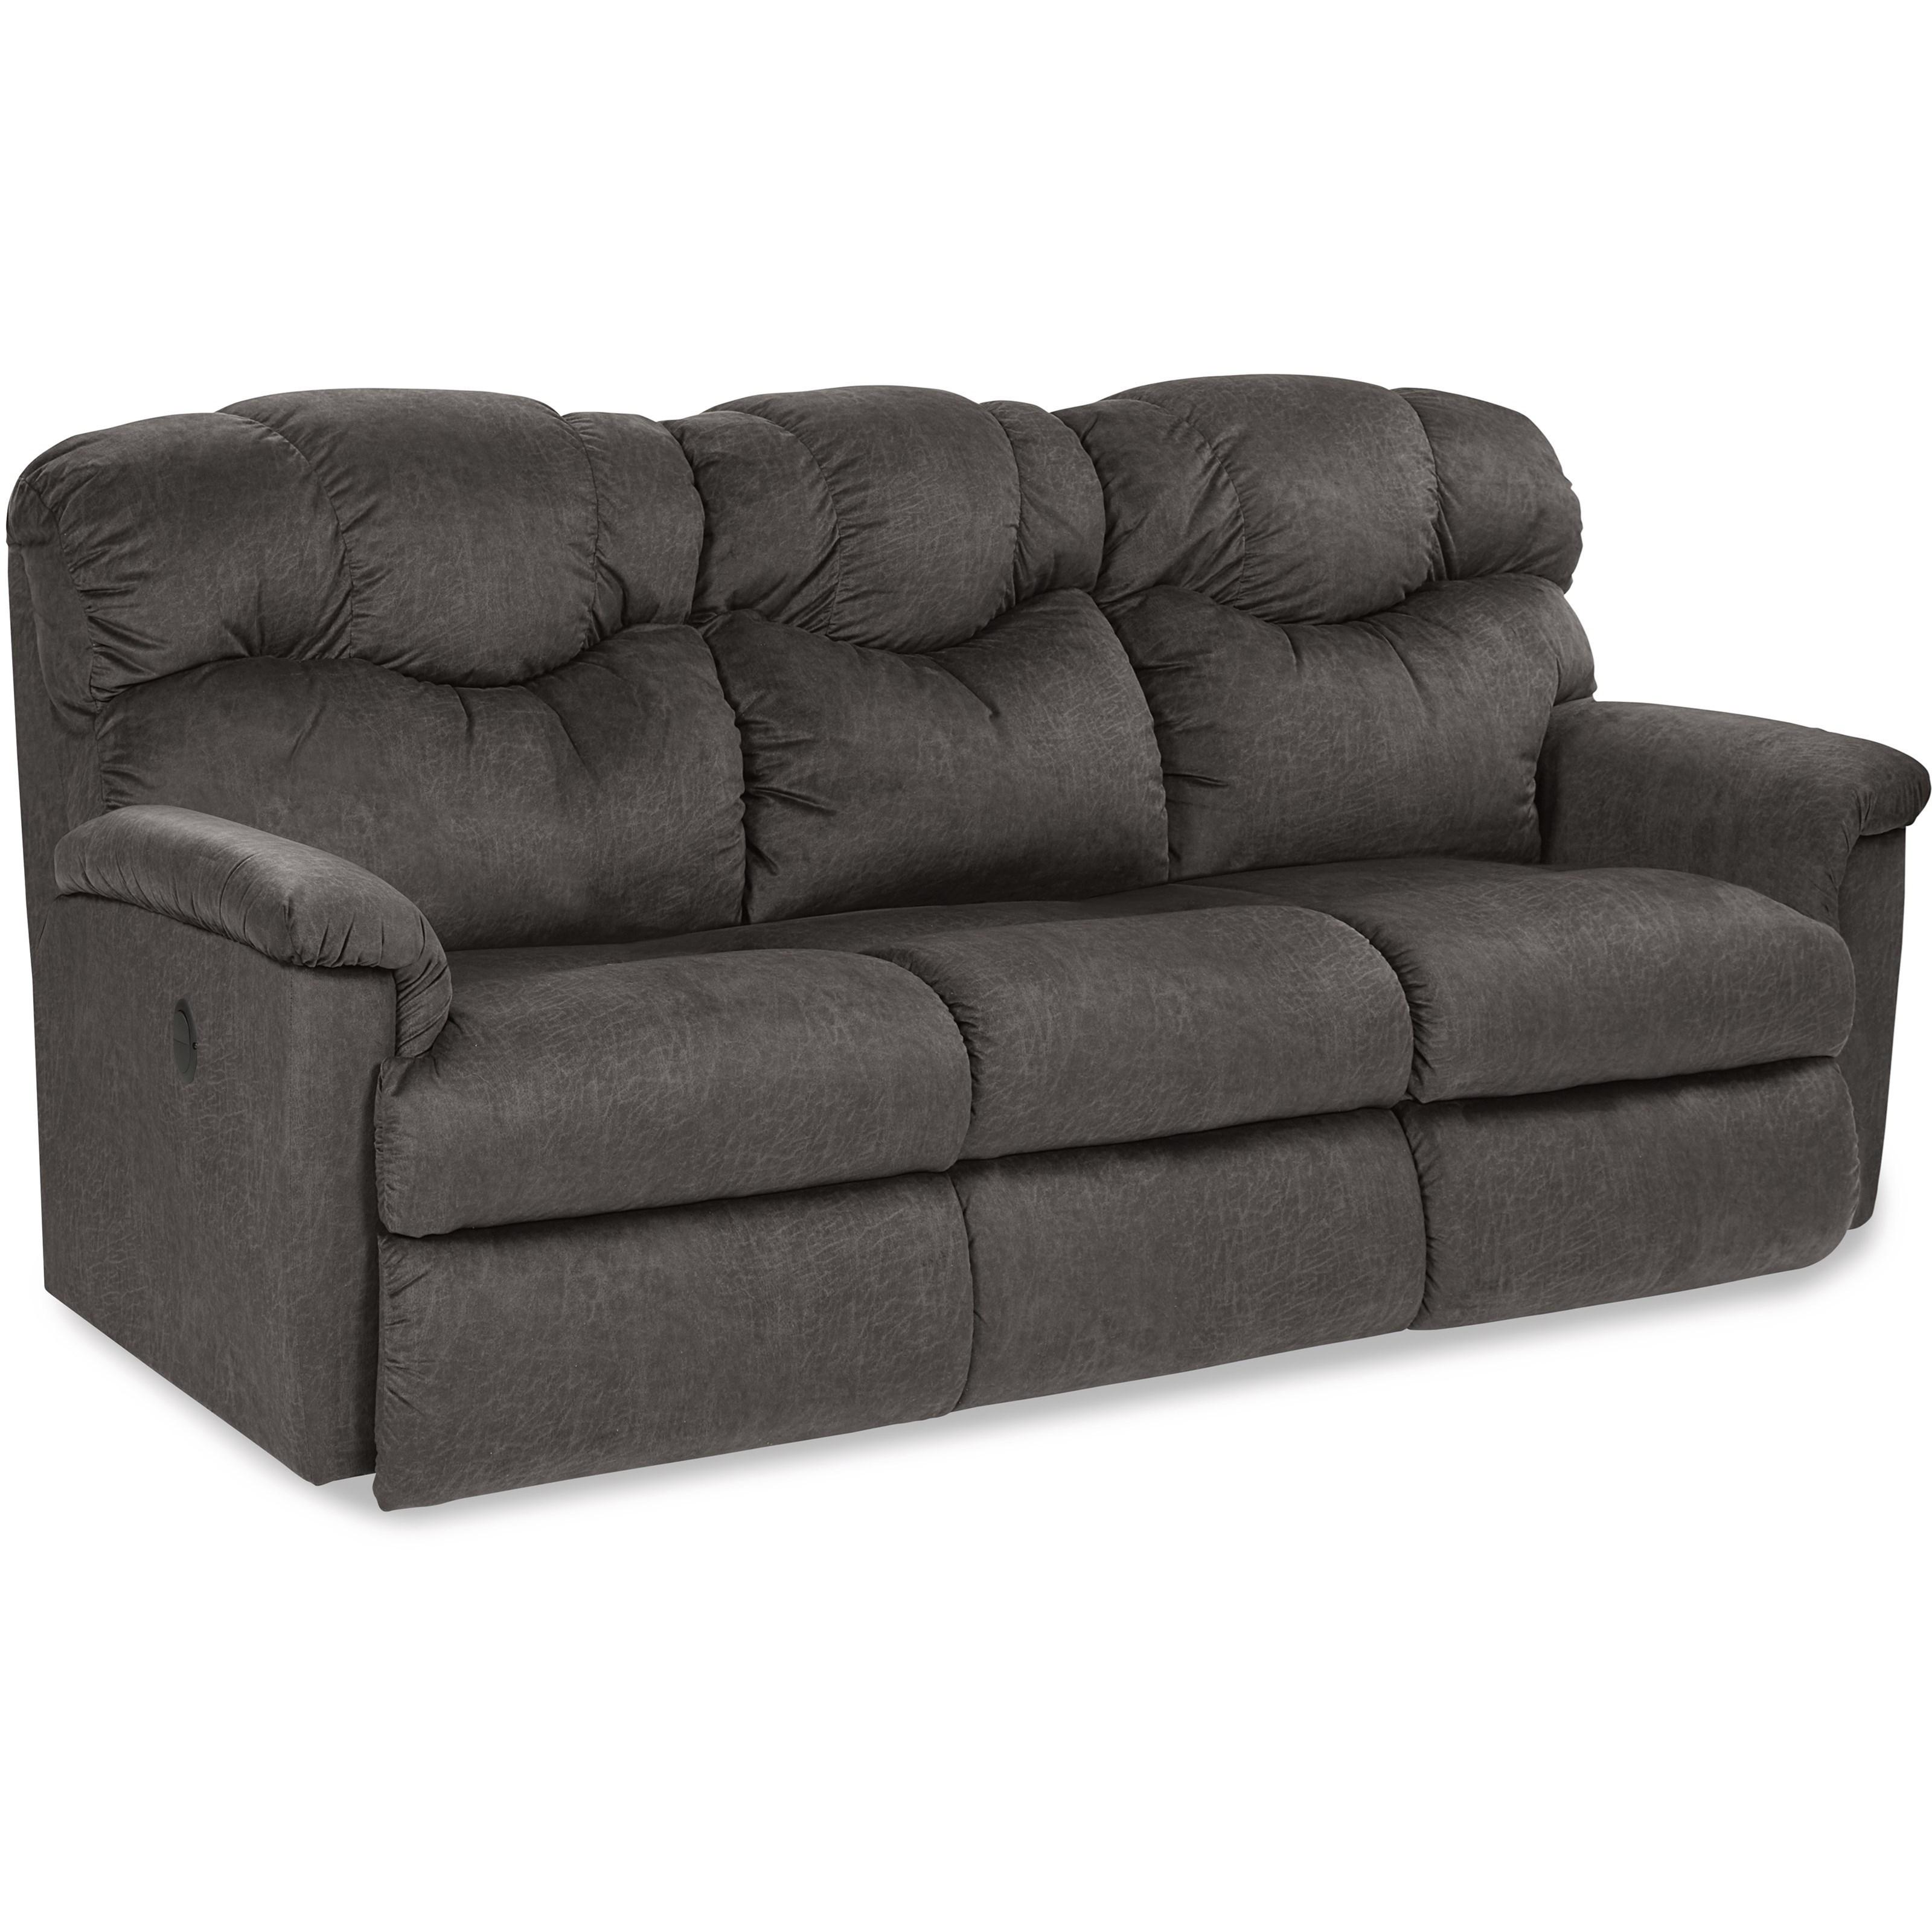 La Z Boy Lancer Power La Z Time 174 Full Reclining Sofa